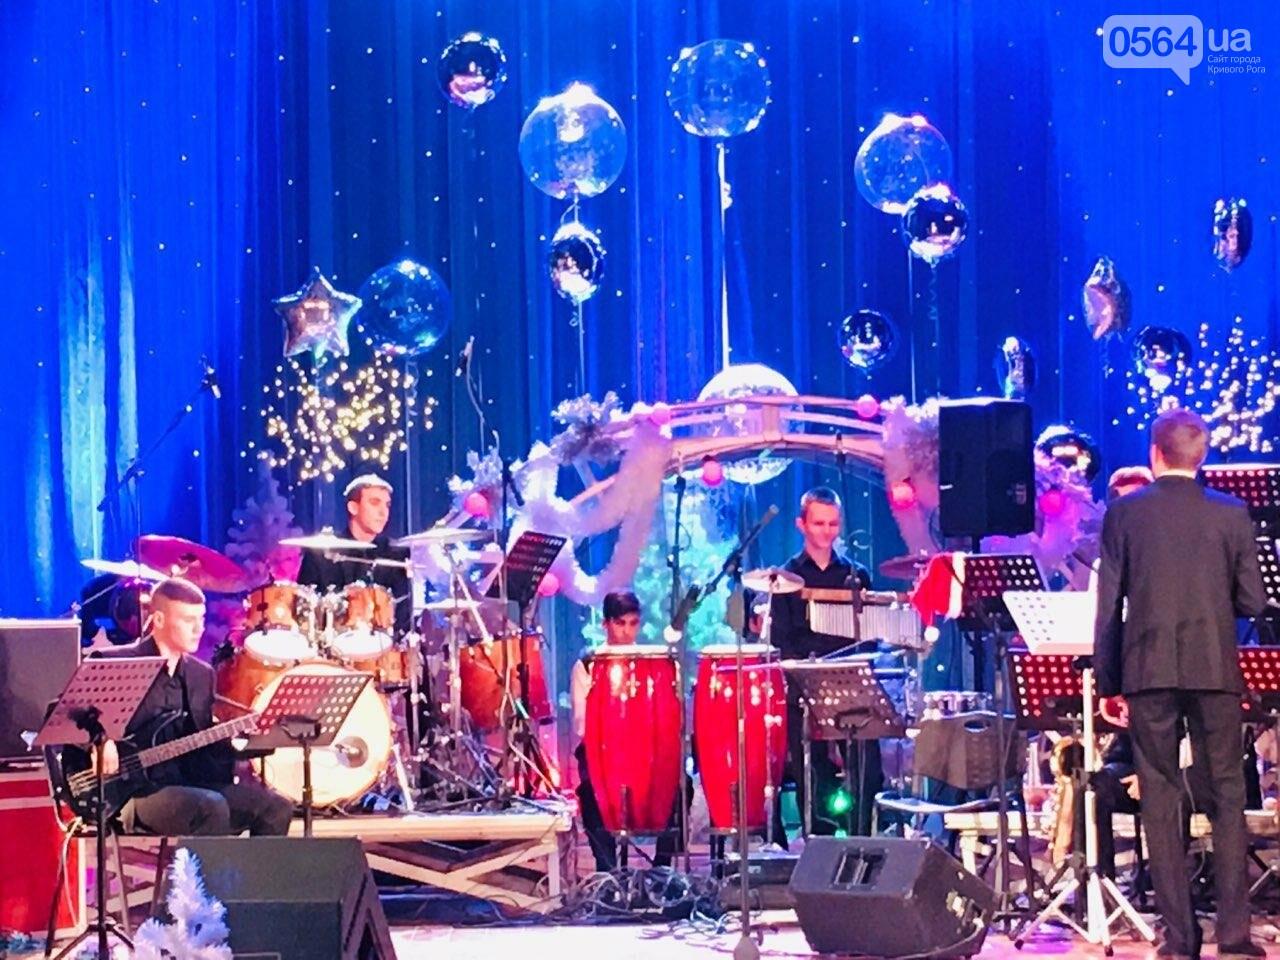 """Let it Snow"": на первое Рождество в Кривом Роге играют джаз, - ФОТО, ВИДЕО, фото-8"